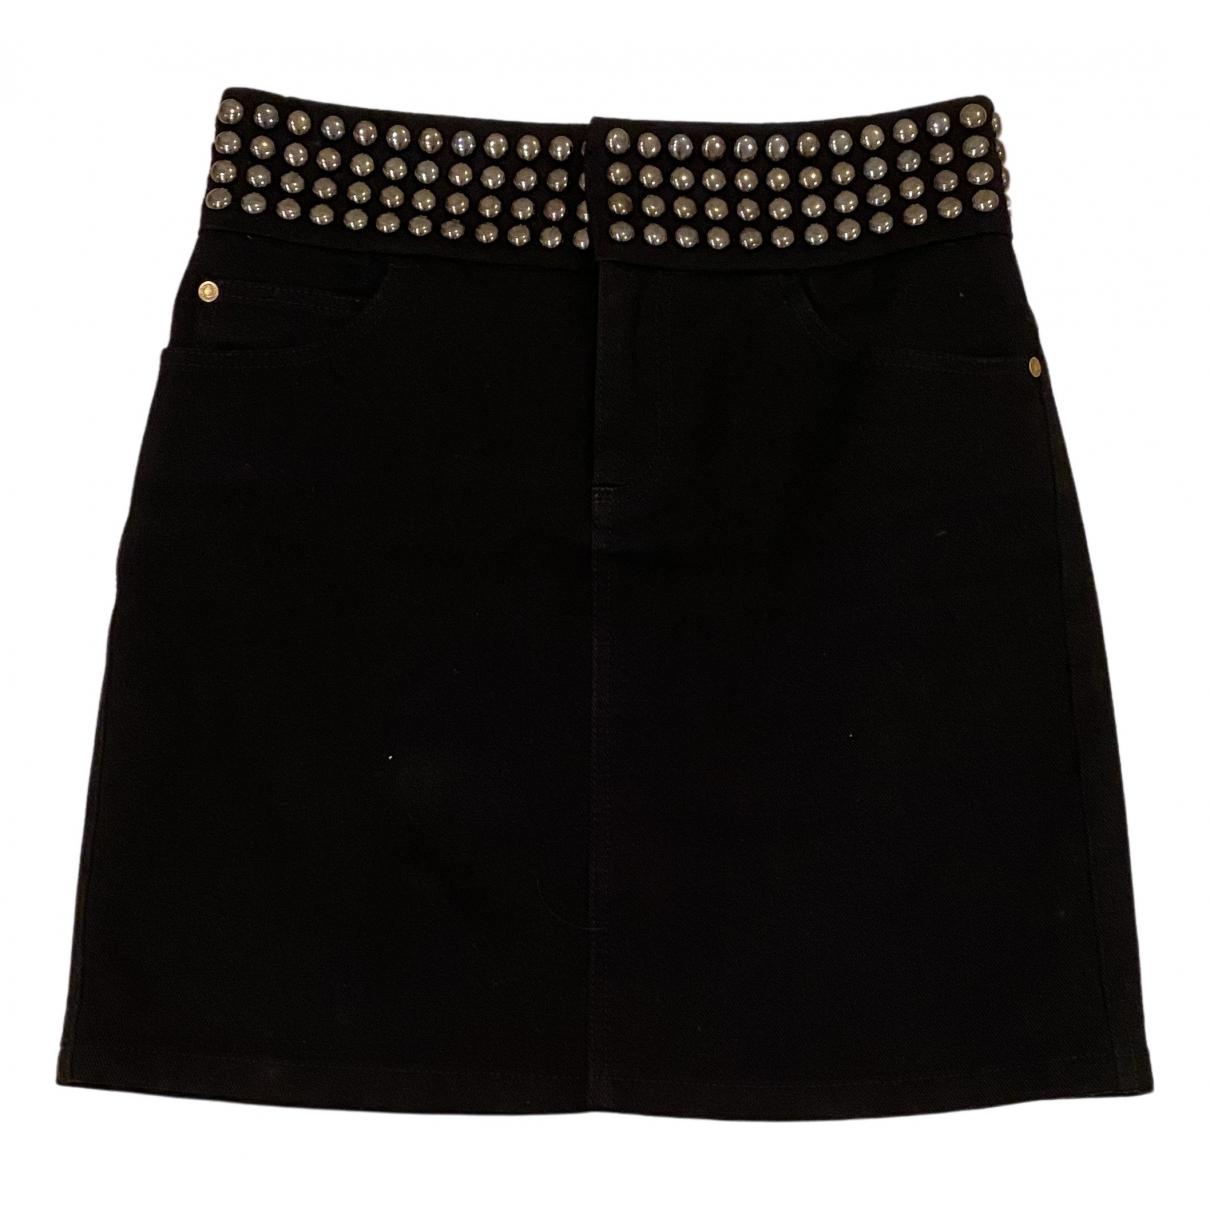 Gucci \N Black Denim - Jeans skirt for Women 38 IT